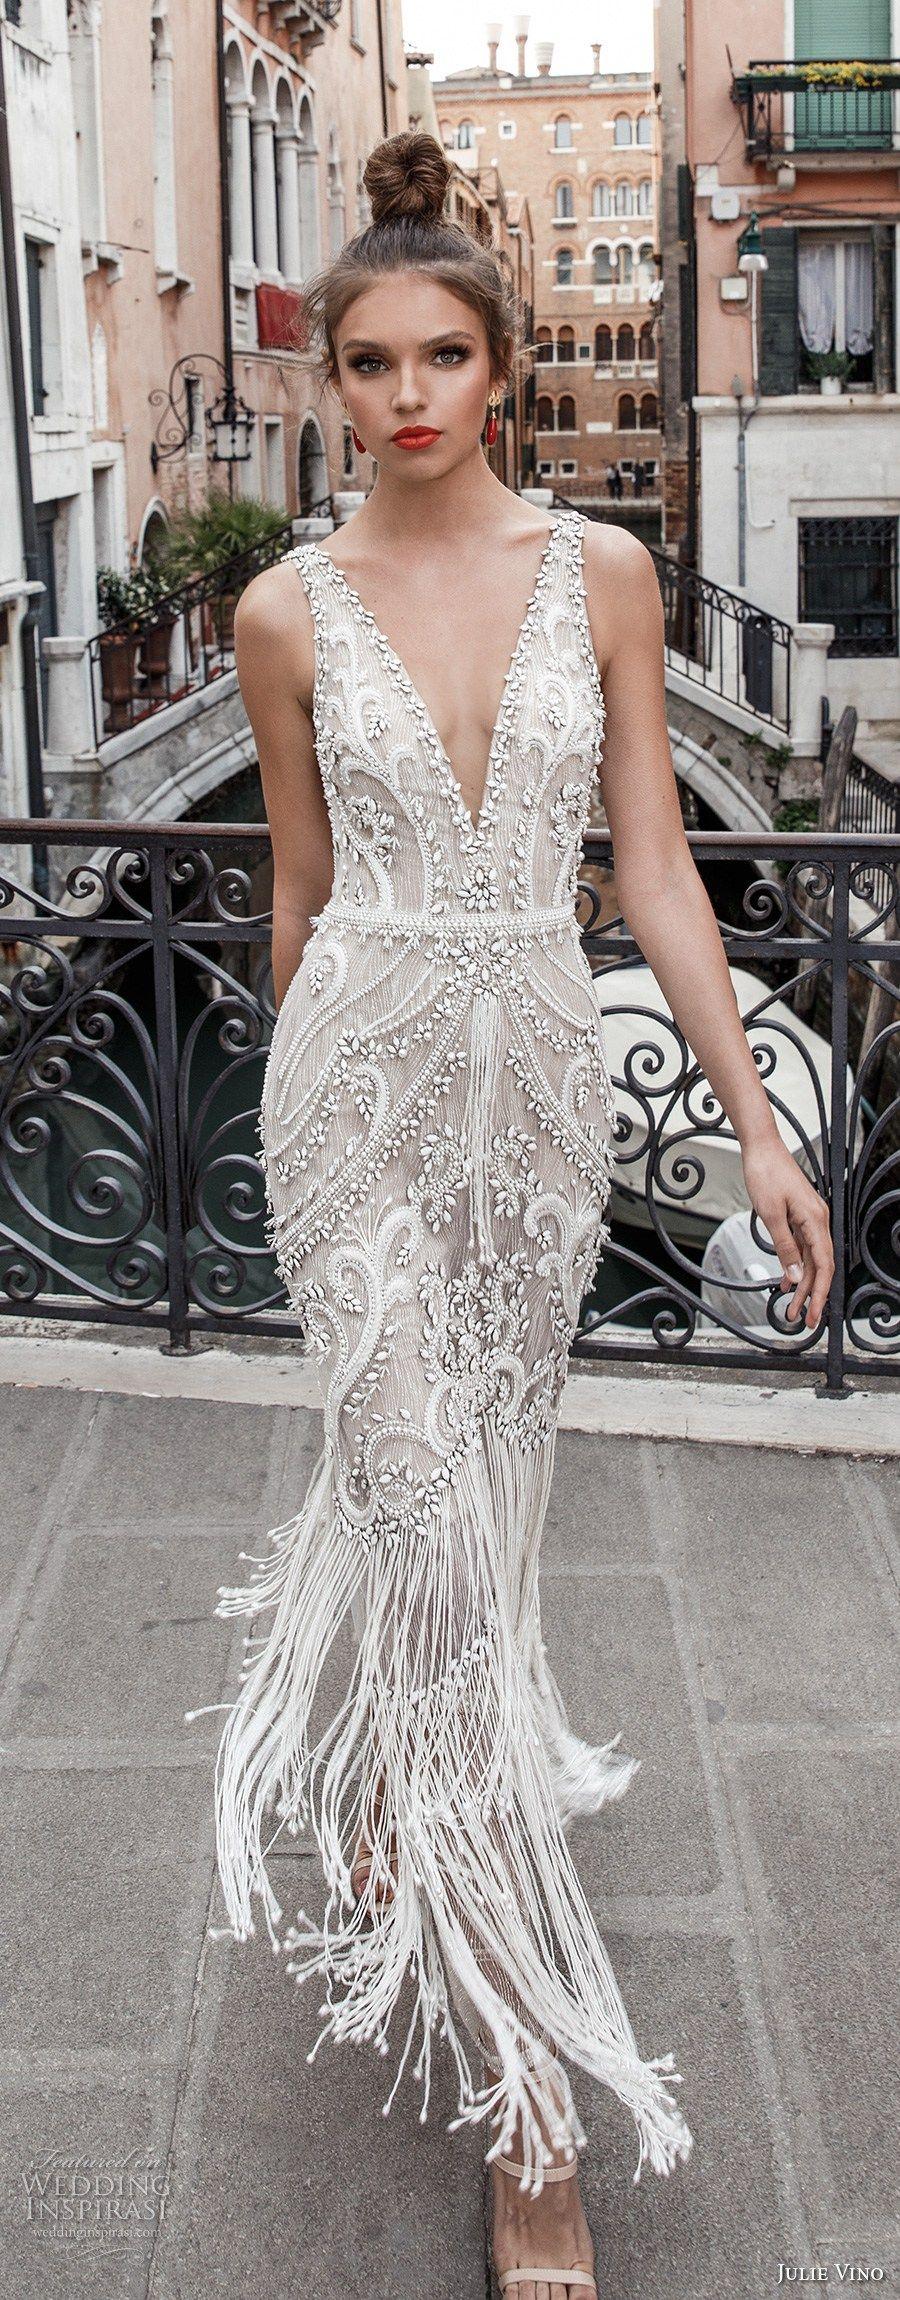 Julie vino spring wedding dresses ucveneziaud bridal collection